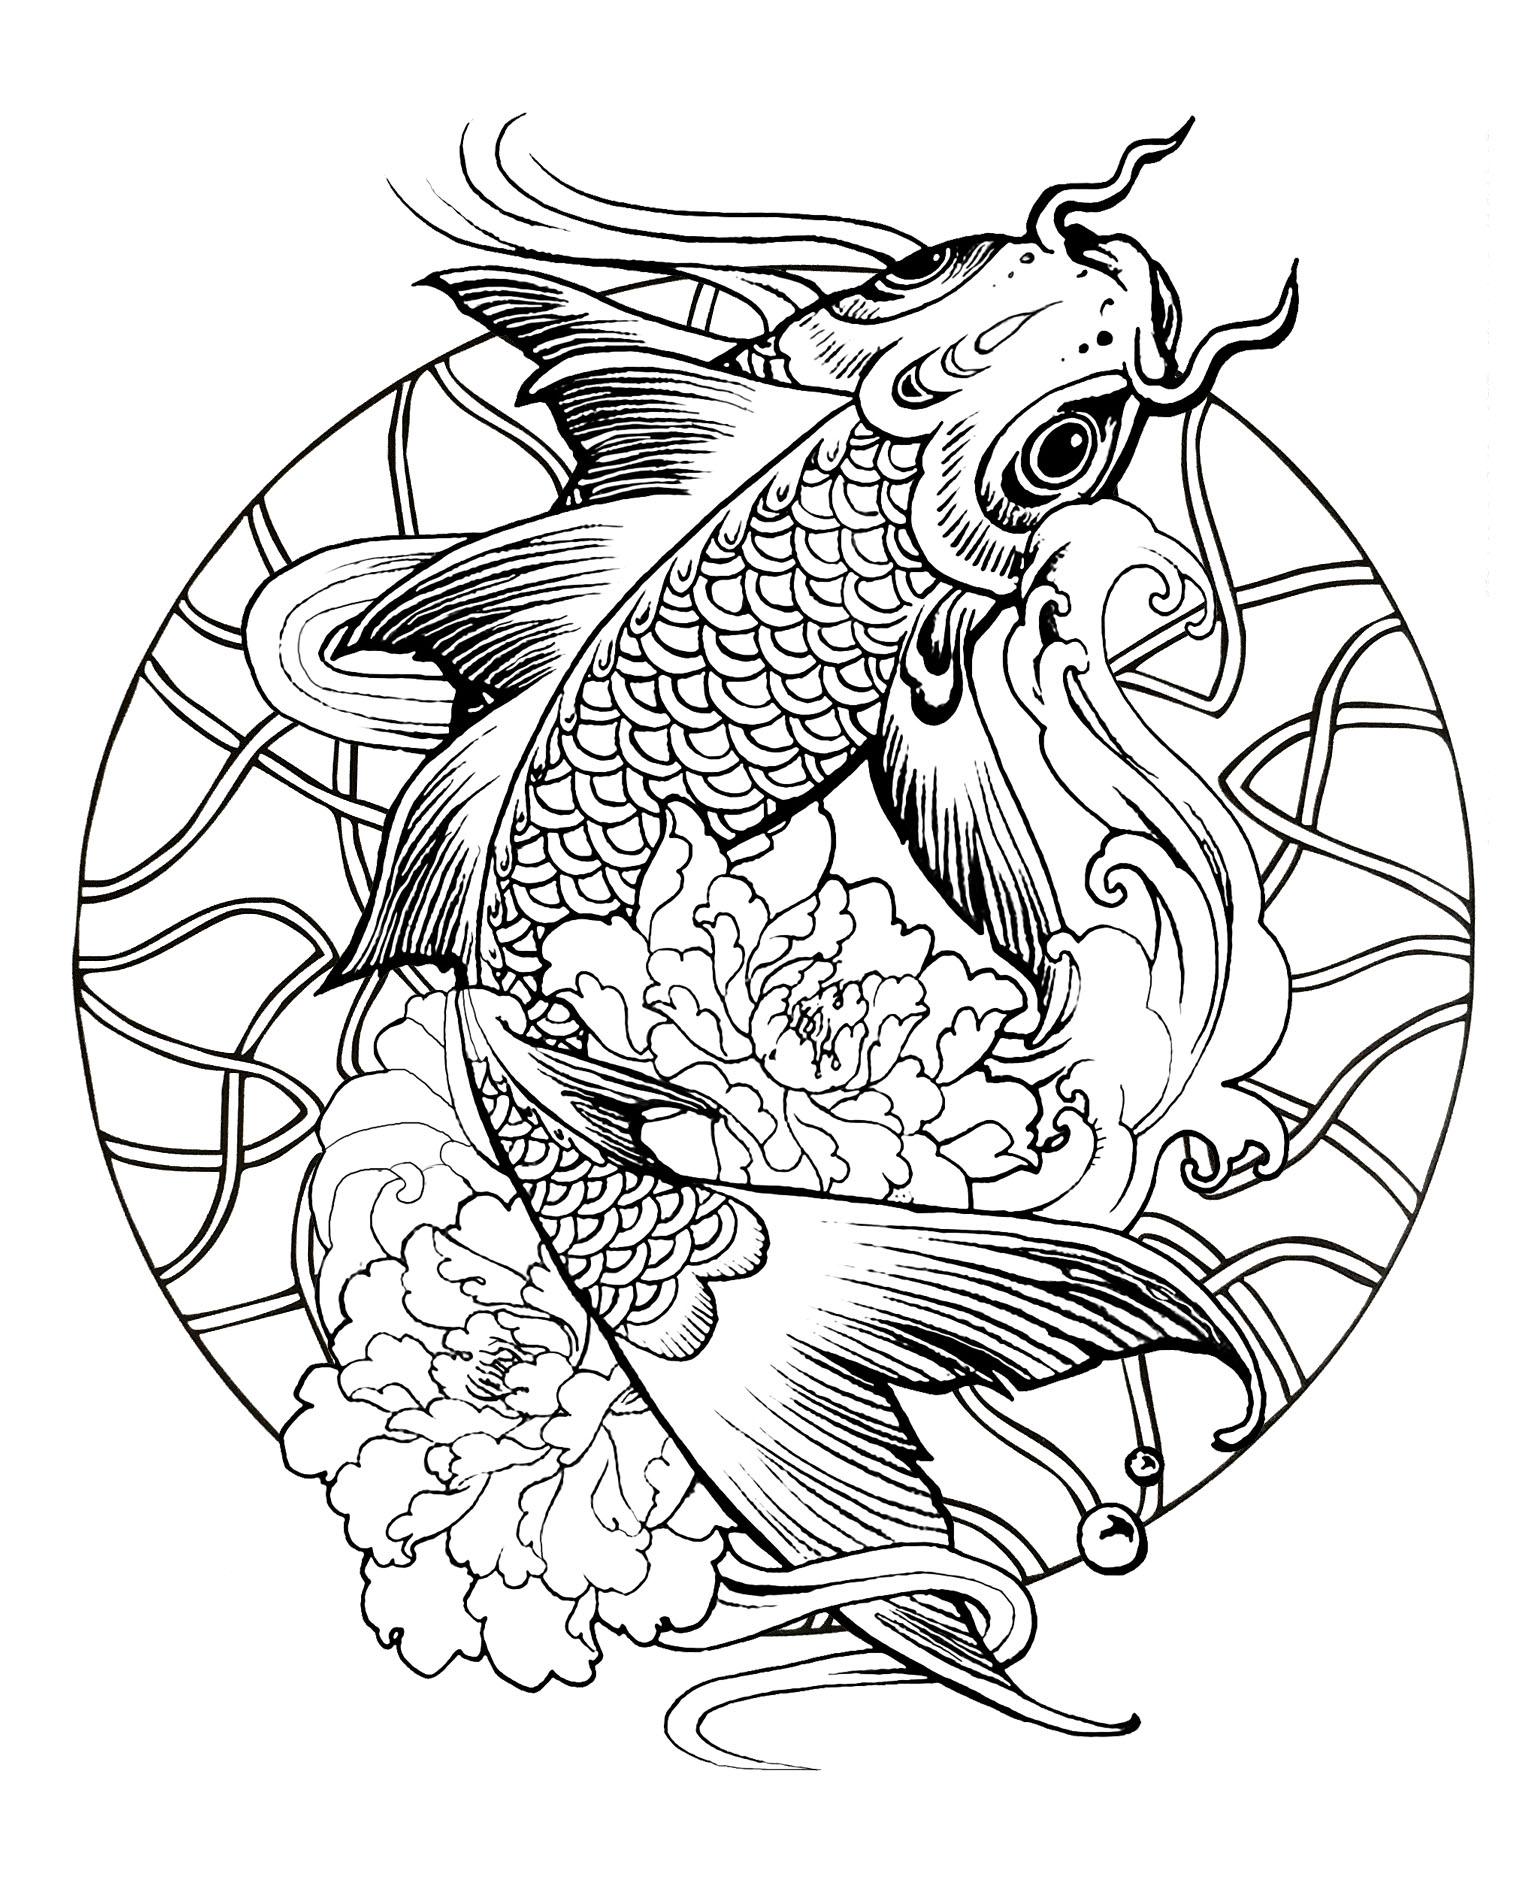 Mandalas 37734 mandalas disegni da colorare per adulti - Pagine da colorare pesci per adulti ...